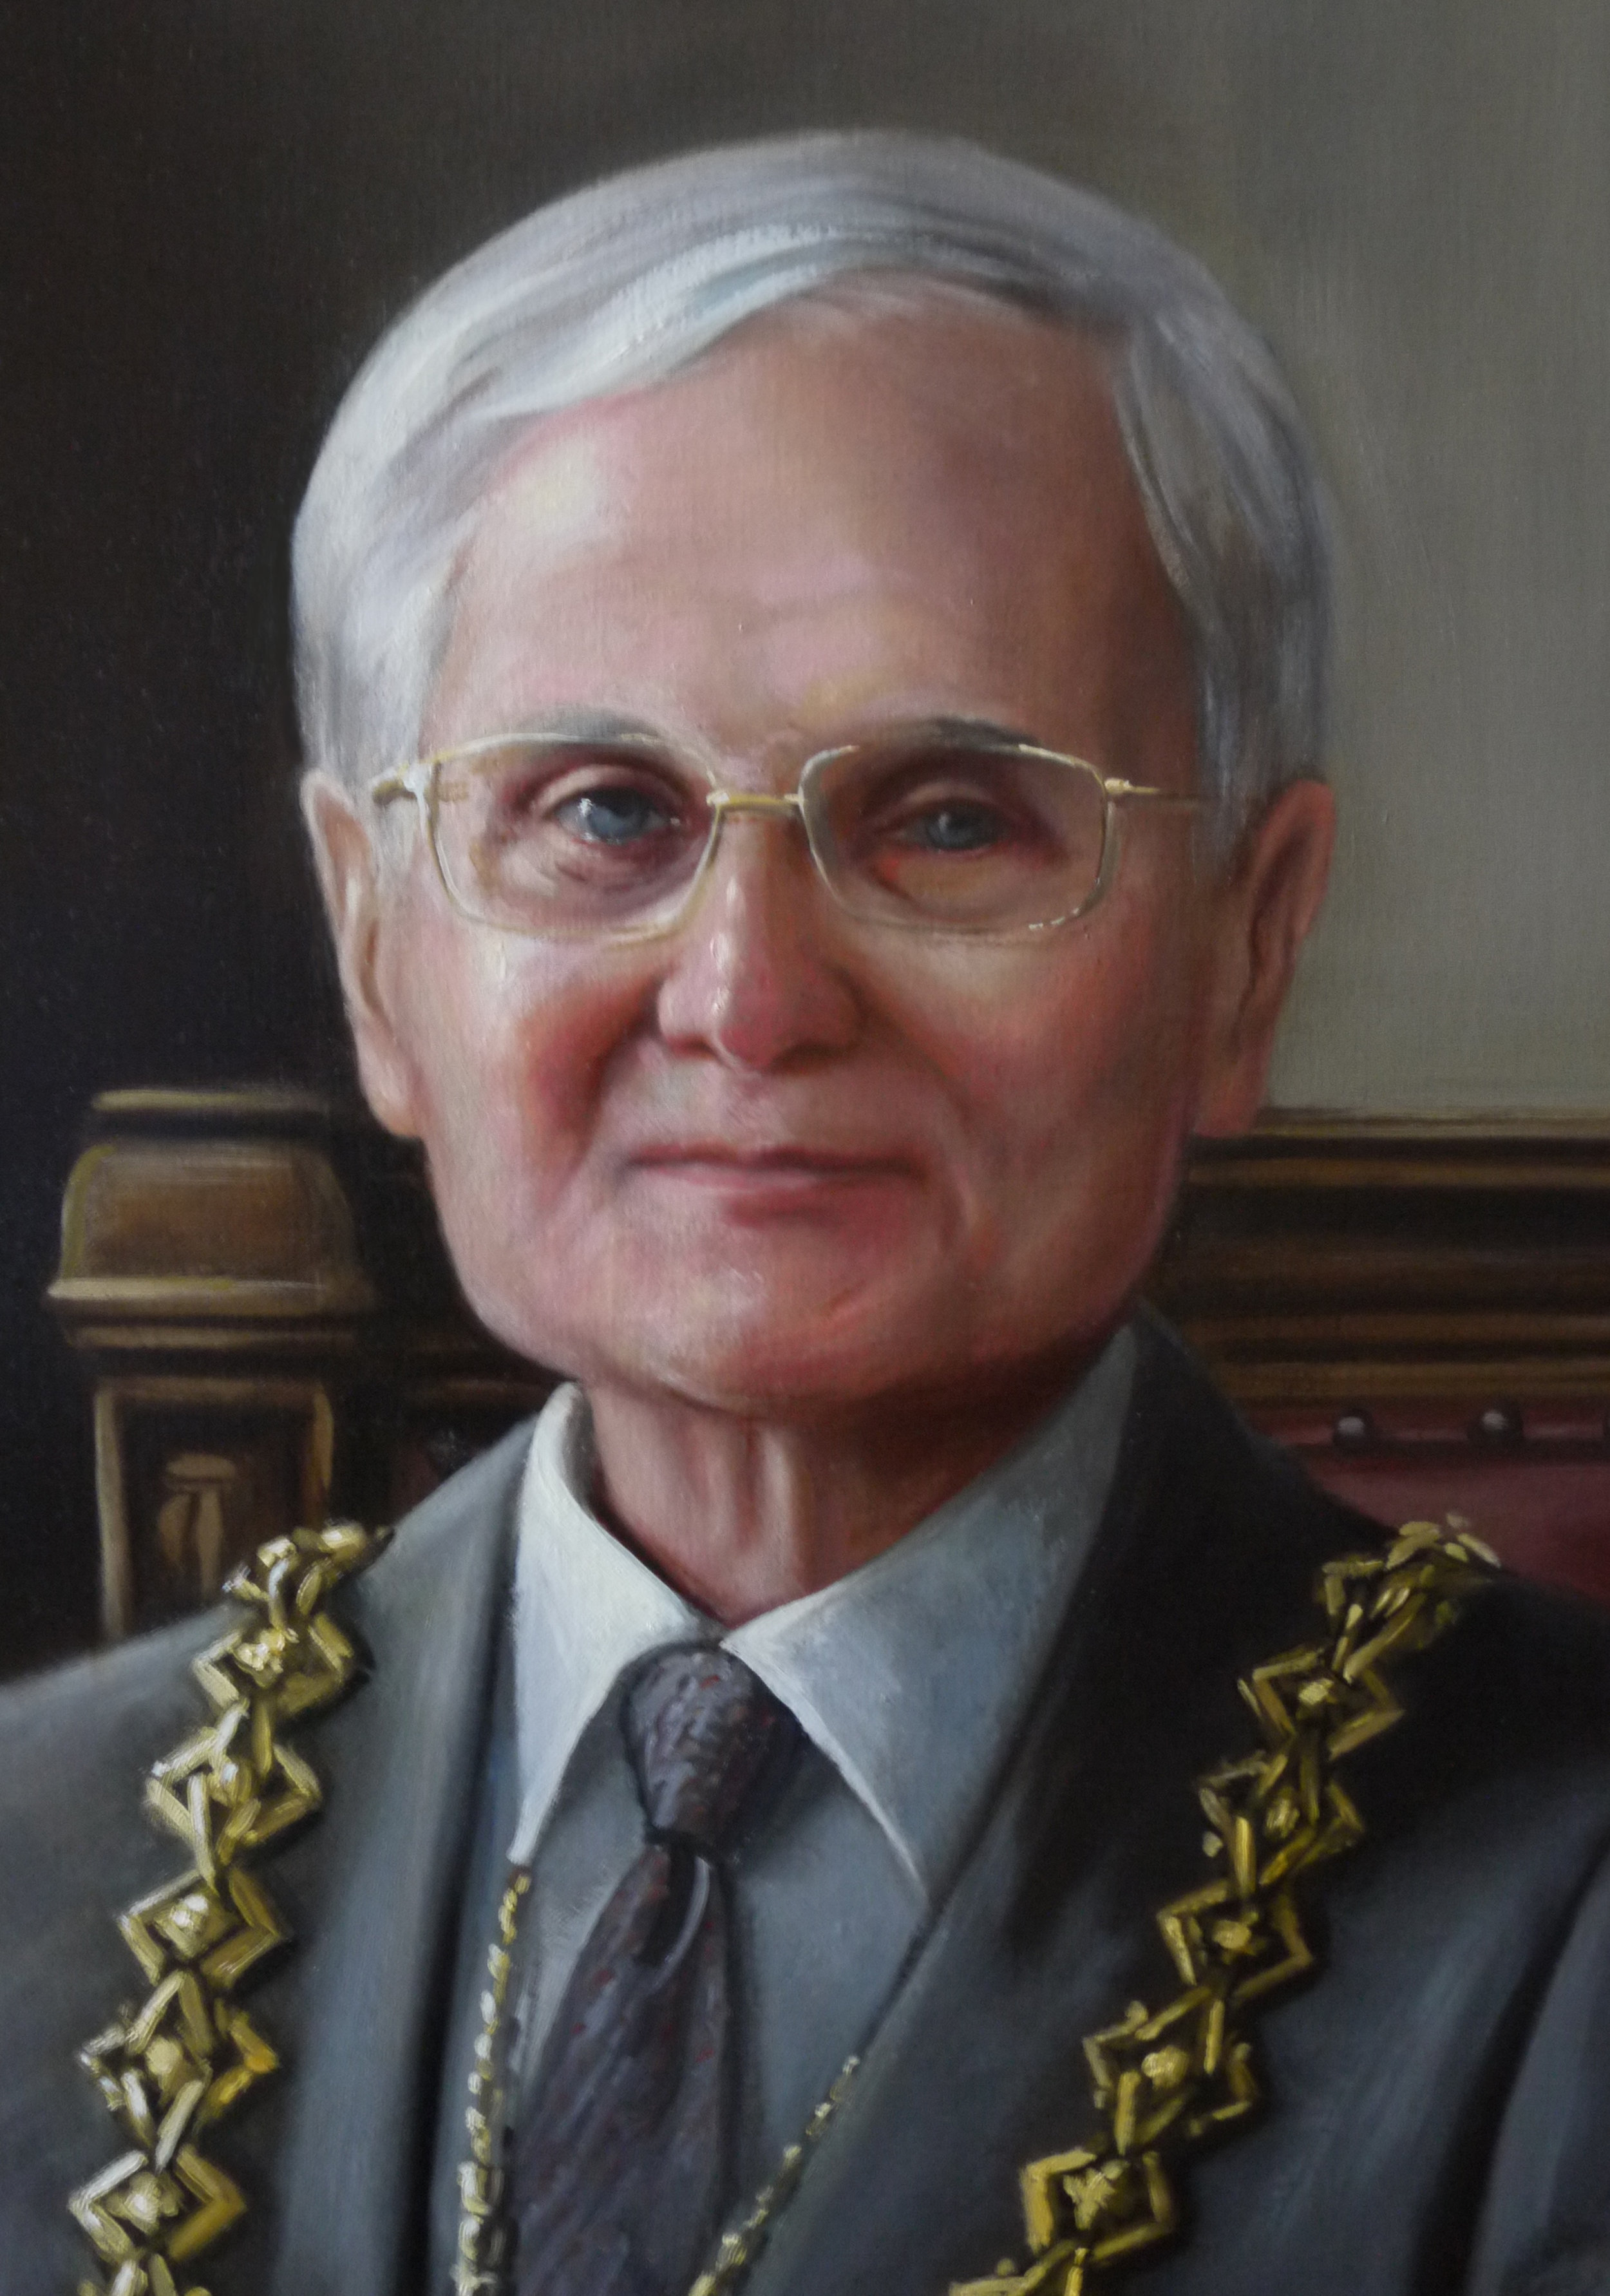 Ian Borthwick, Lord Provost of Dundee